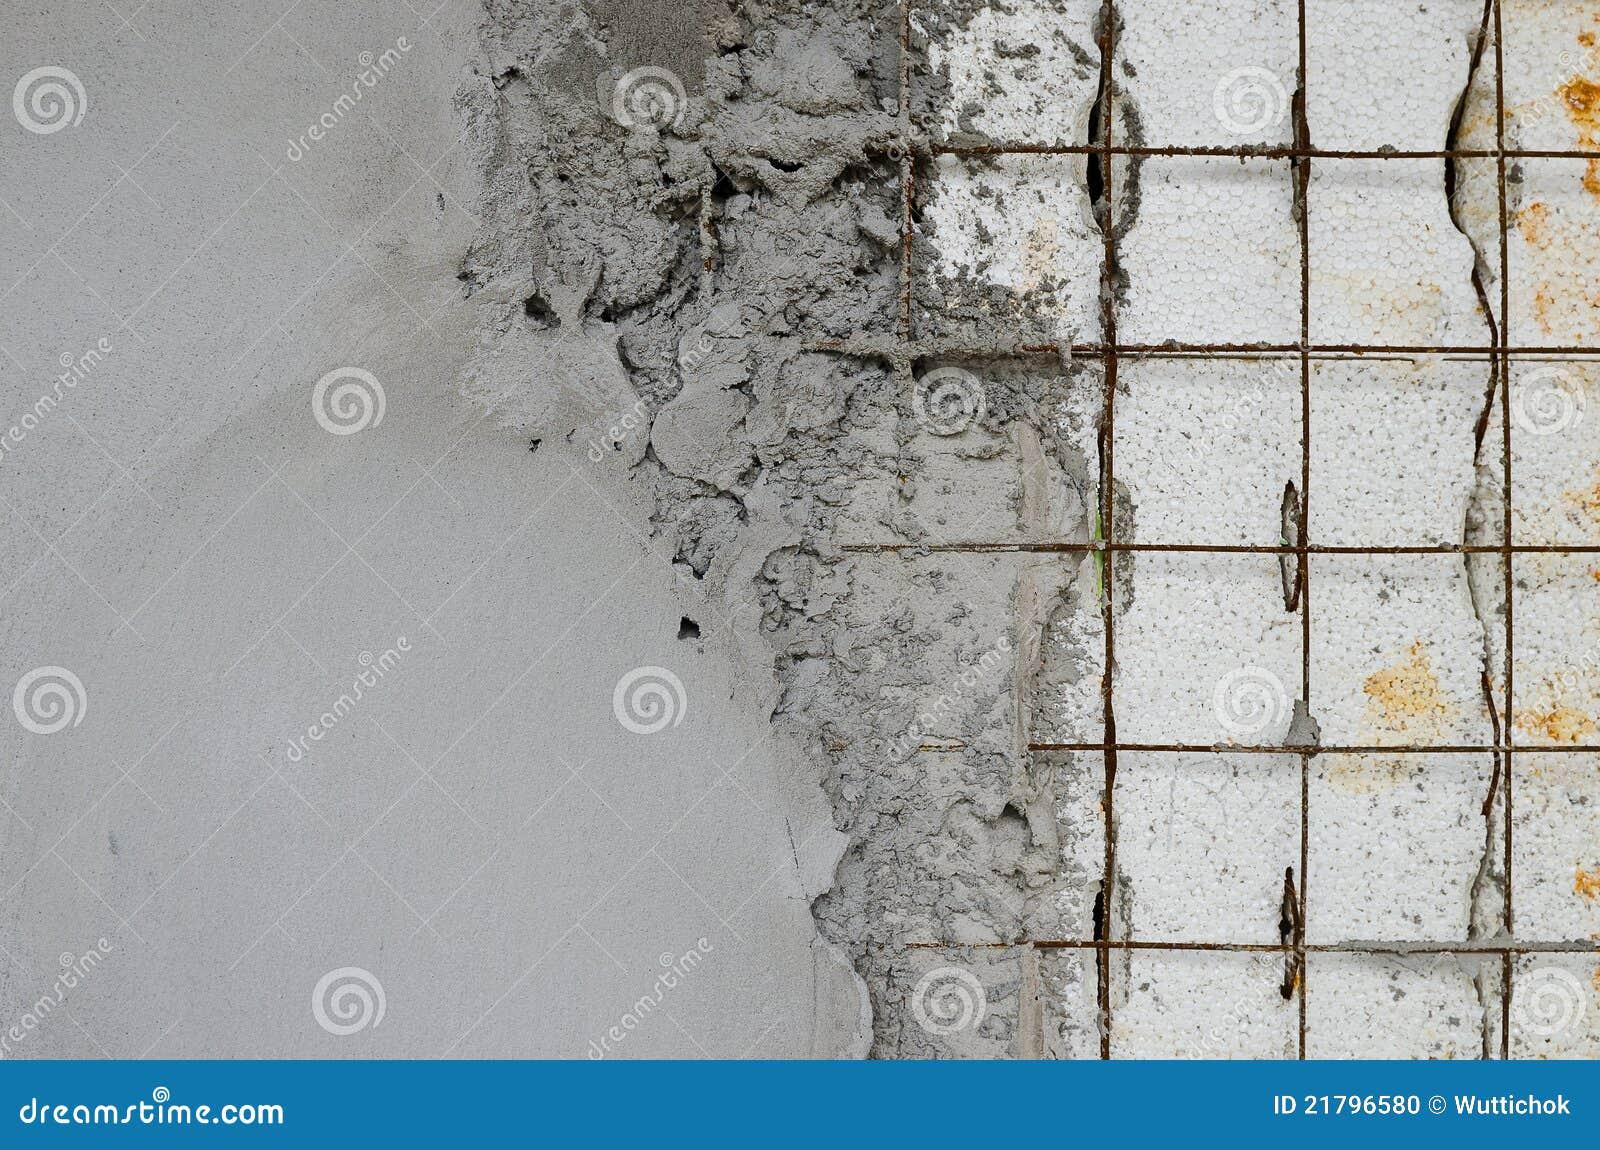 Reinforced Concrete Walls Within The Styrofoam Stock Photo